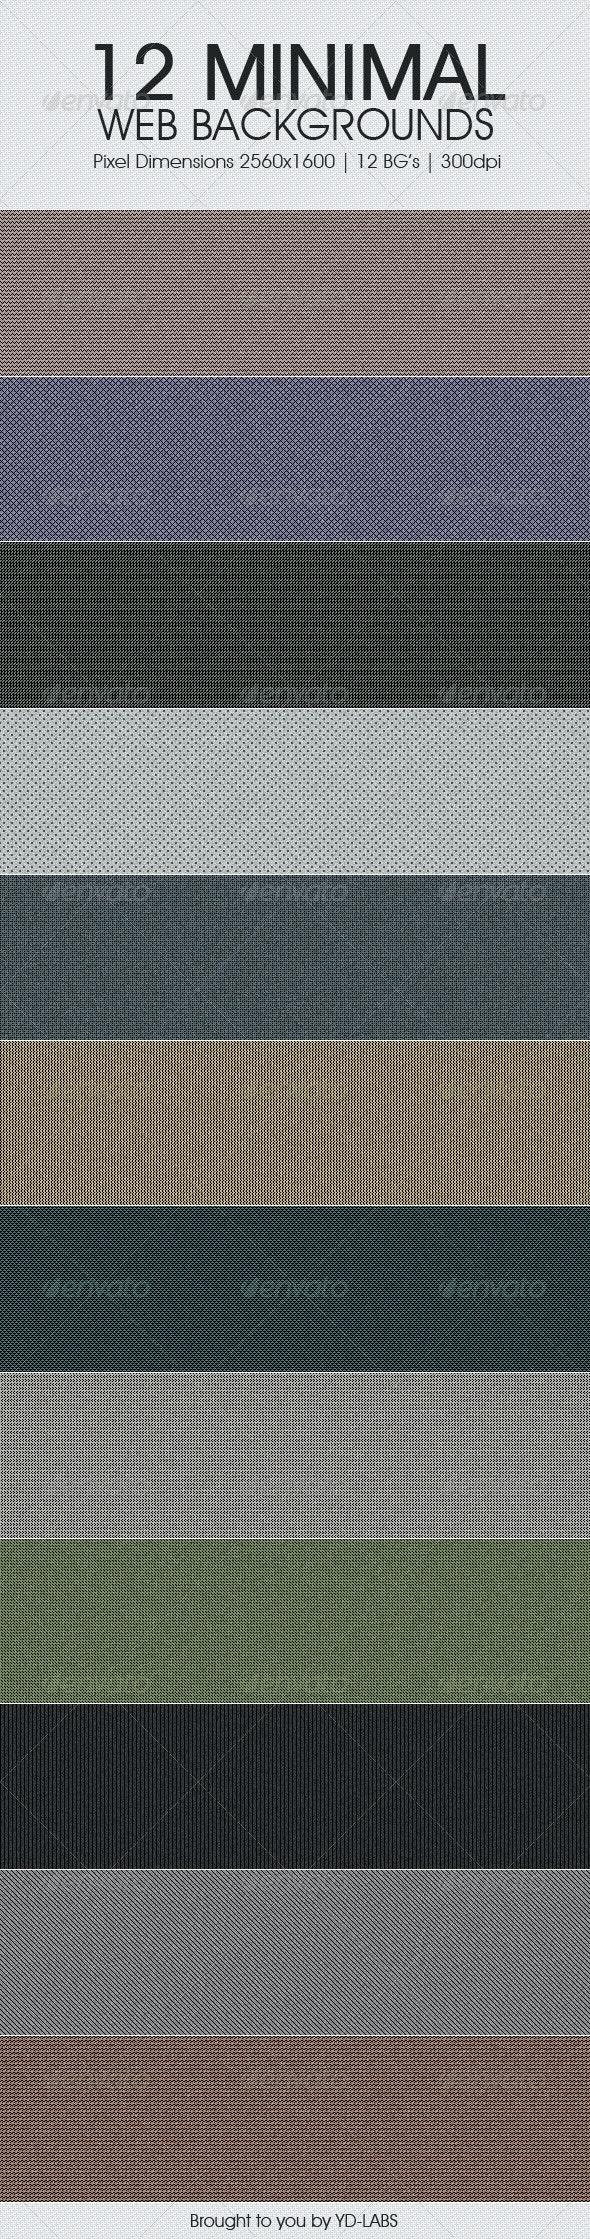 12 Minimal Web Backgrounds - Miscellaneous Backgrounds